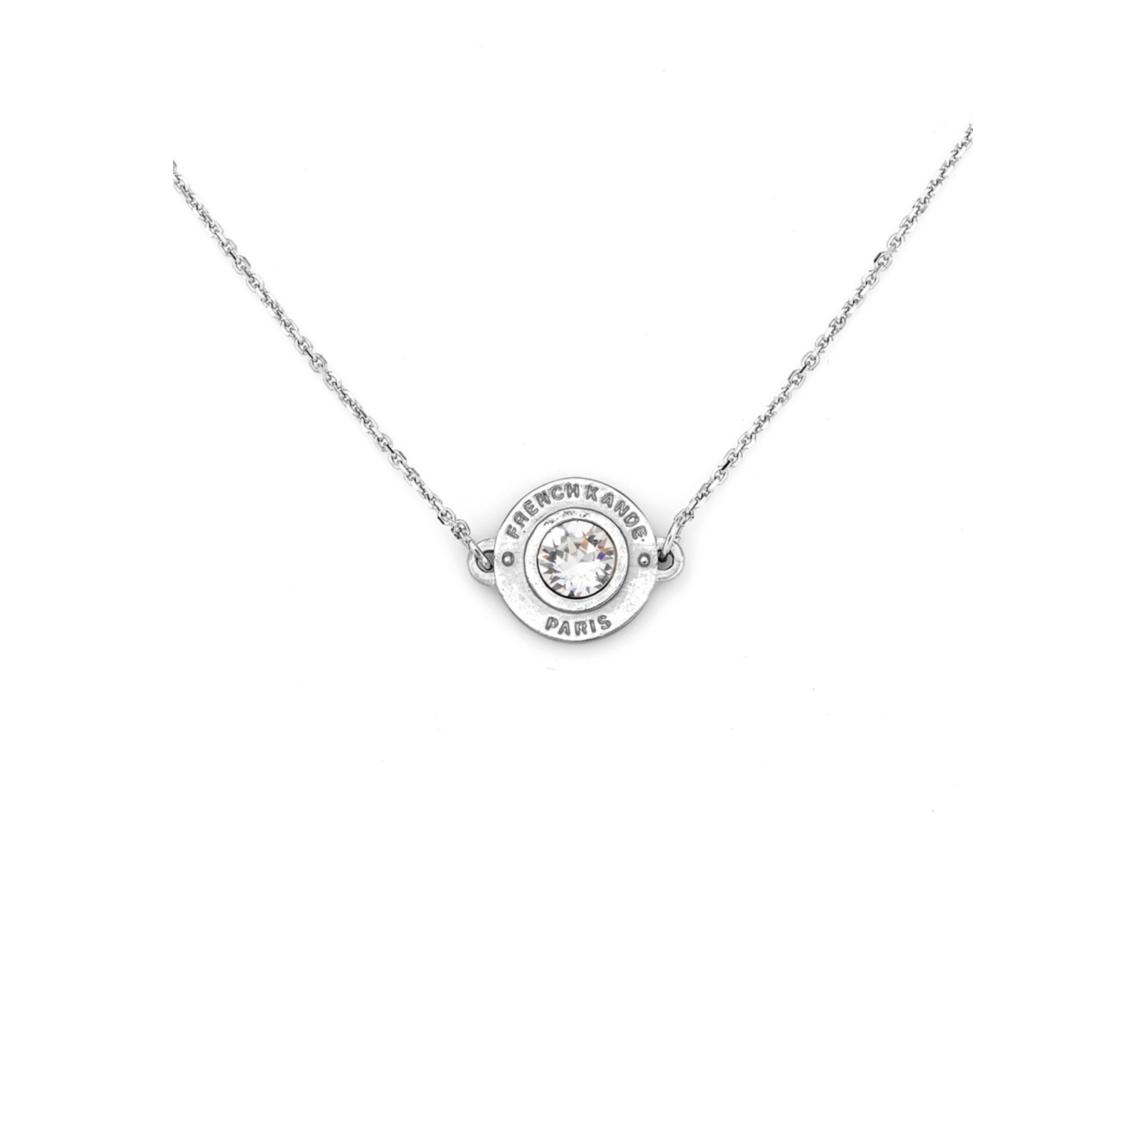 Swarovski Petite Chain Annecy Necklace   Ann Marie's